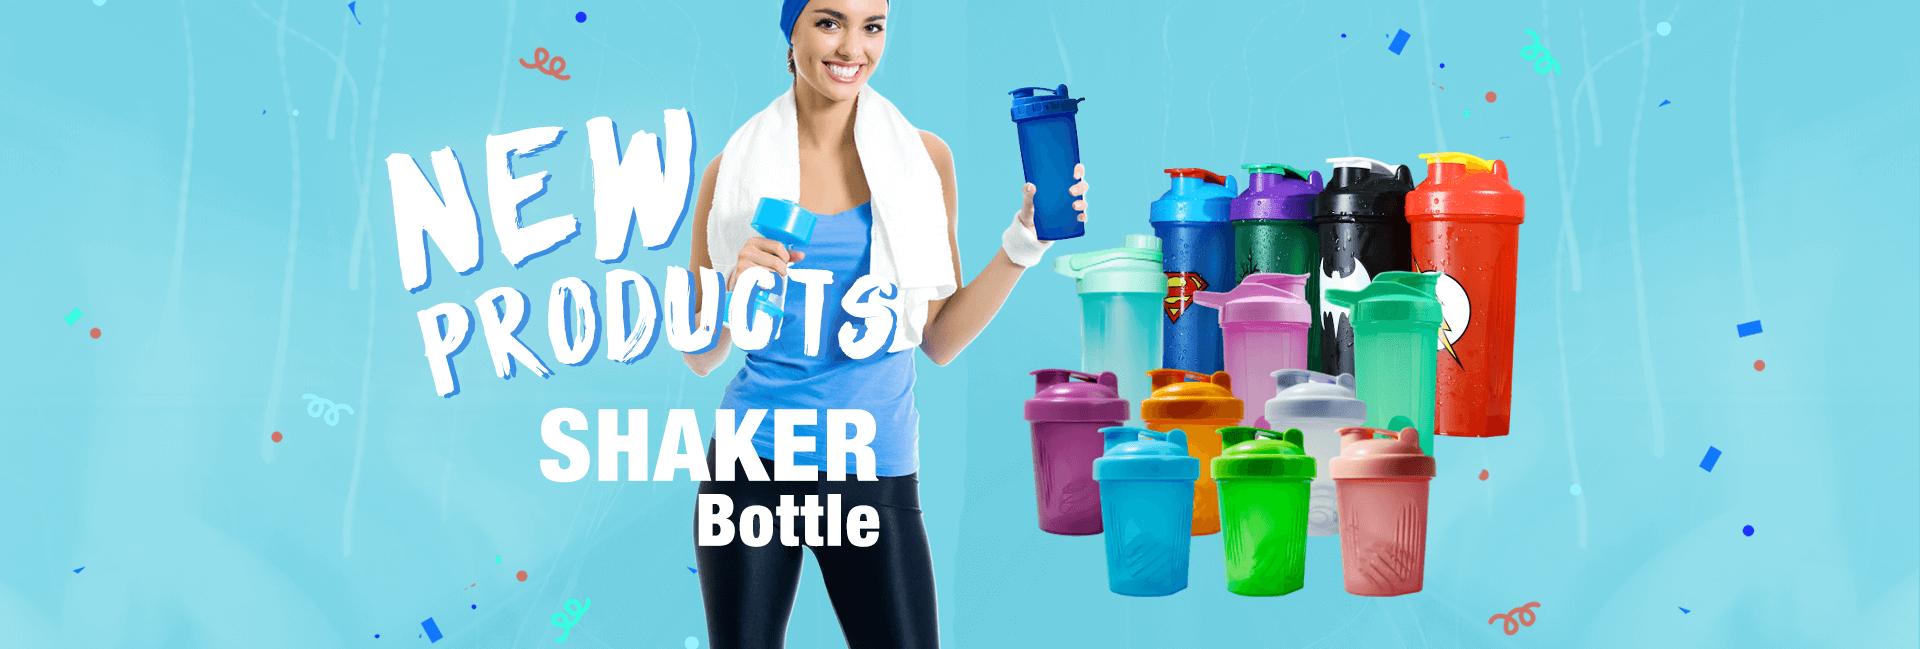 Outdoors sports water bottle